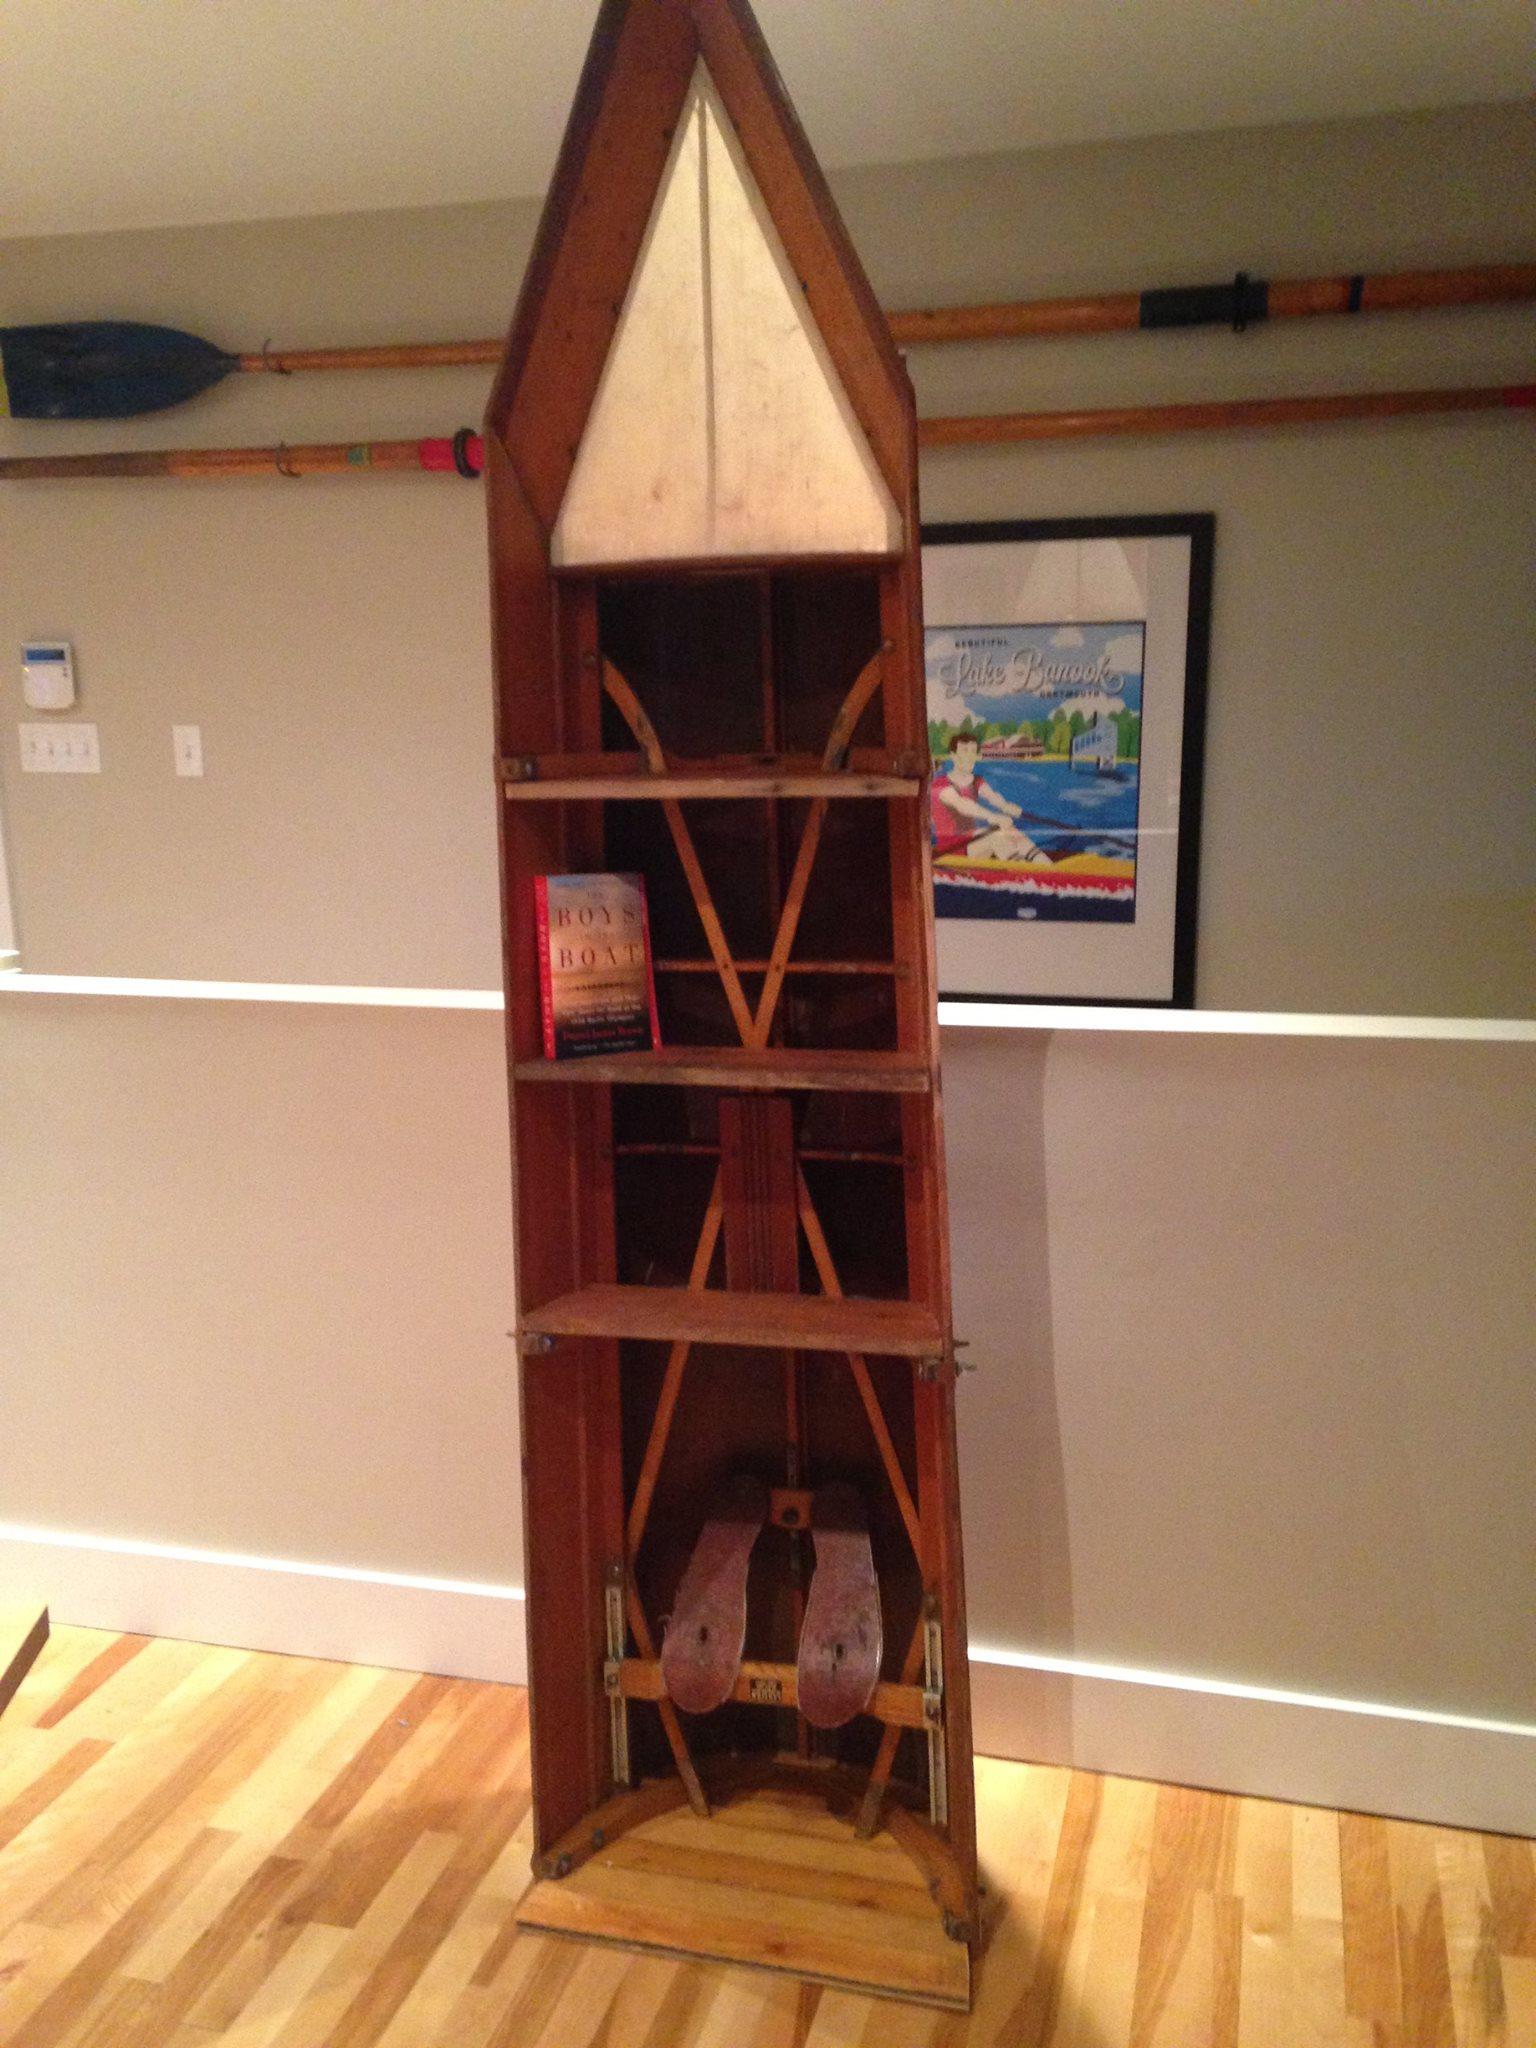 Bookshelf made from broken rowing shell